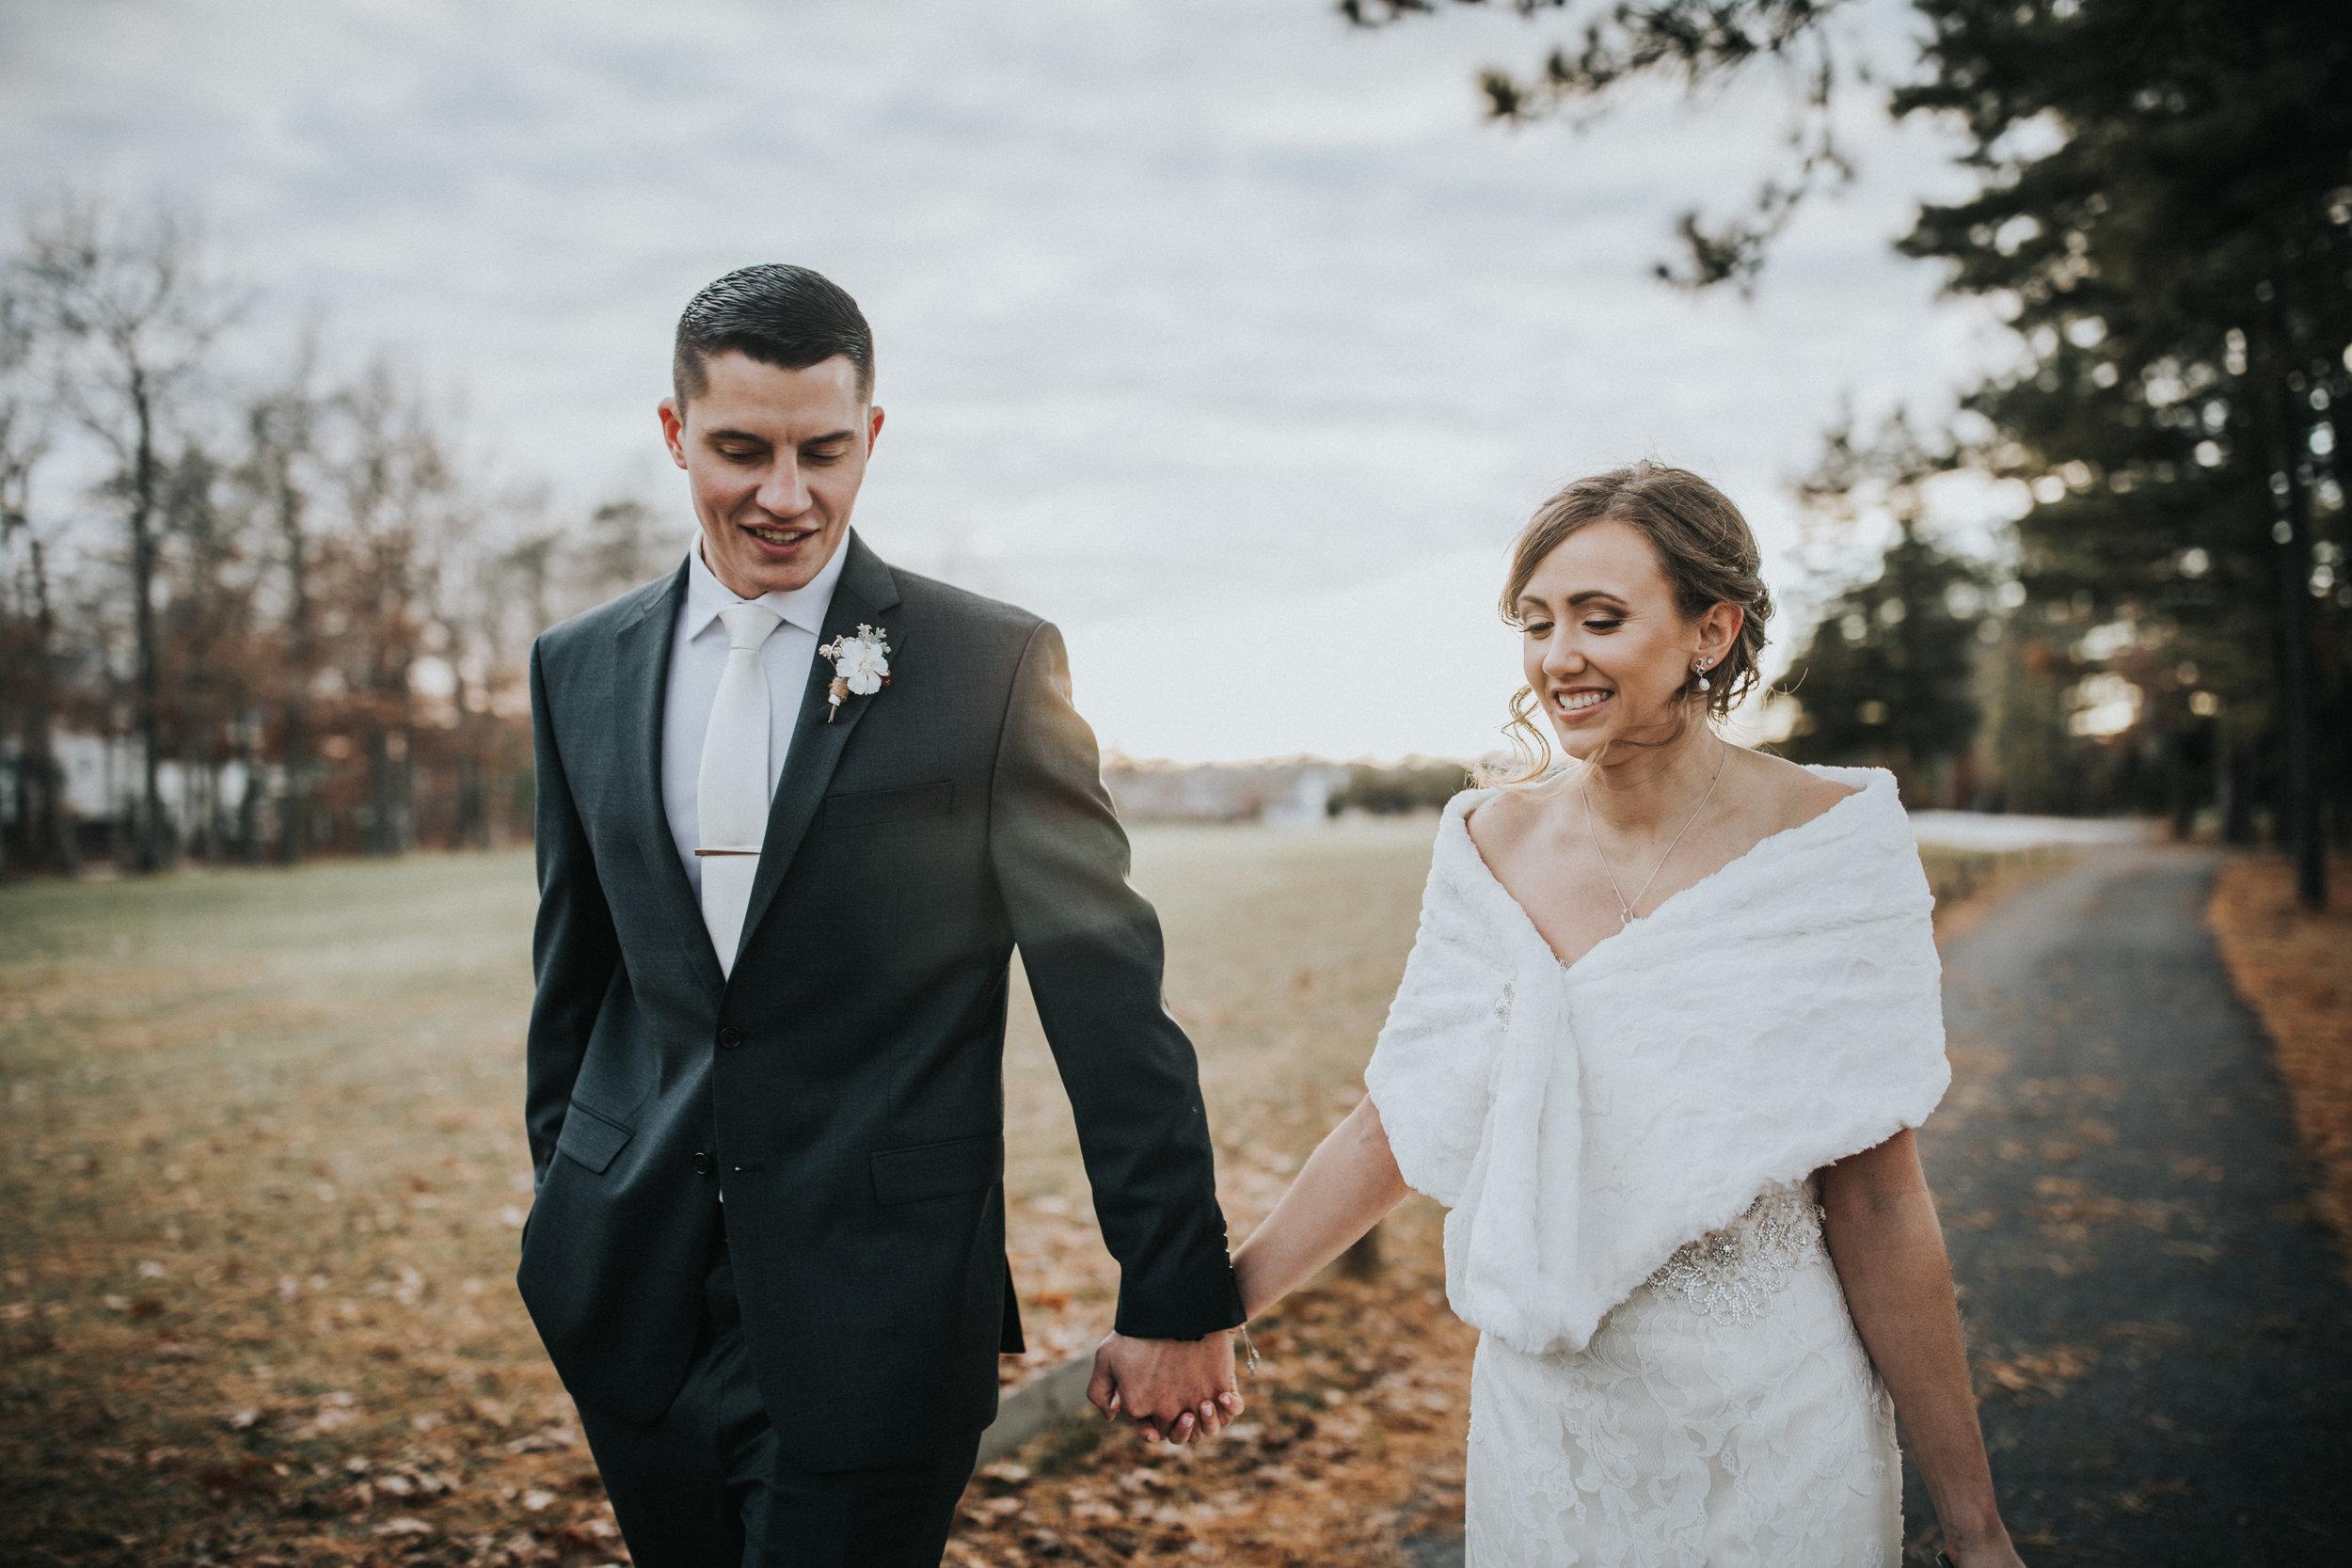 New-Jersey-Wedding-Photographer-JennaLynnPhotography-Blue-Heron-Pines-Sami+Nick-BrideandGroom-24.jpg